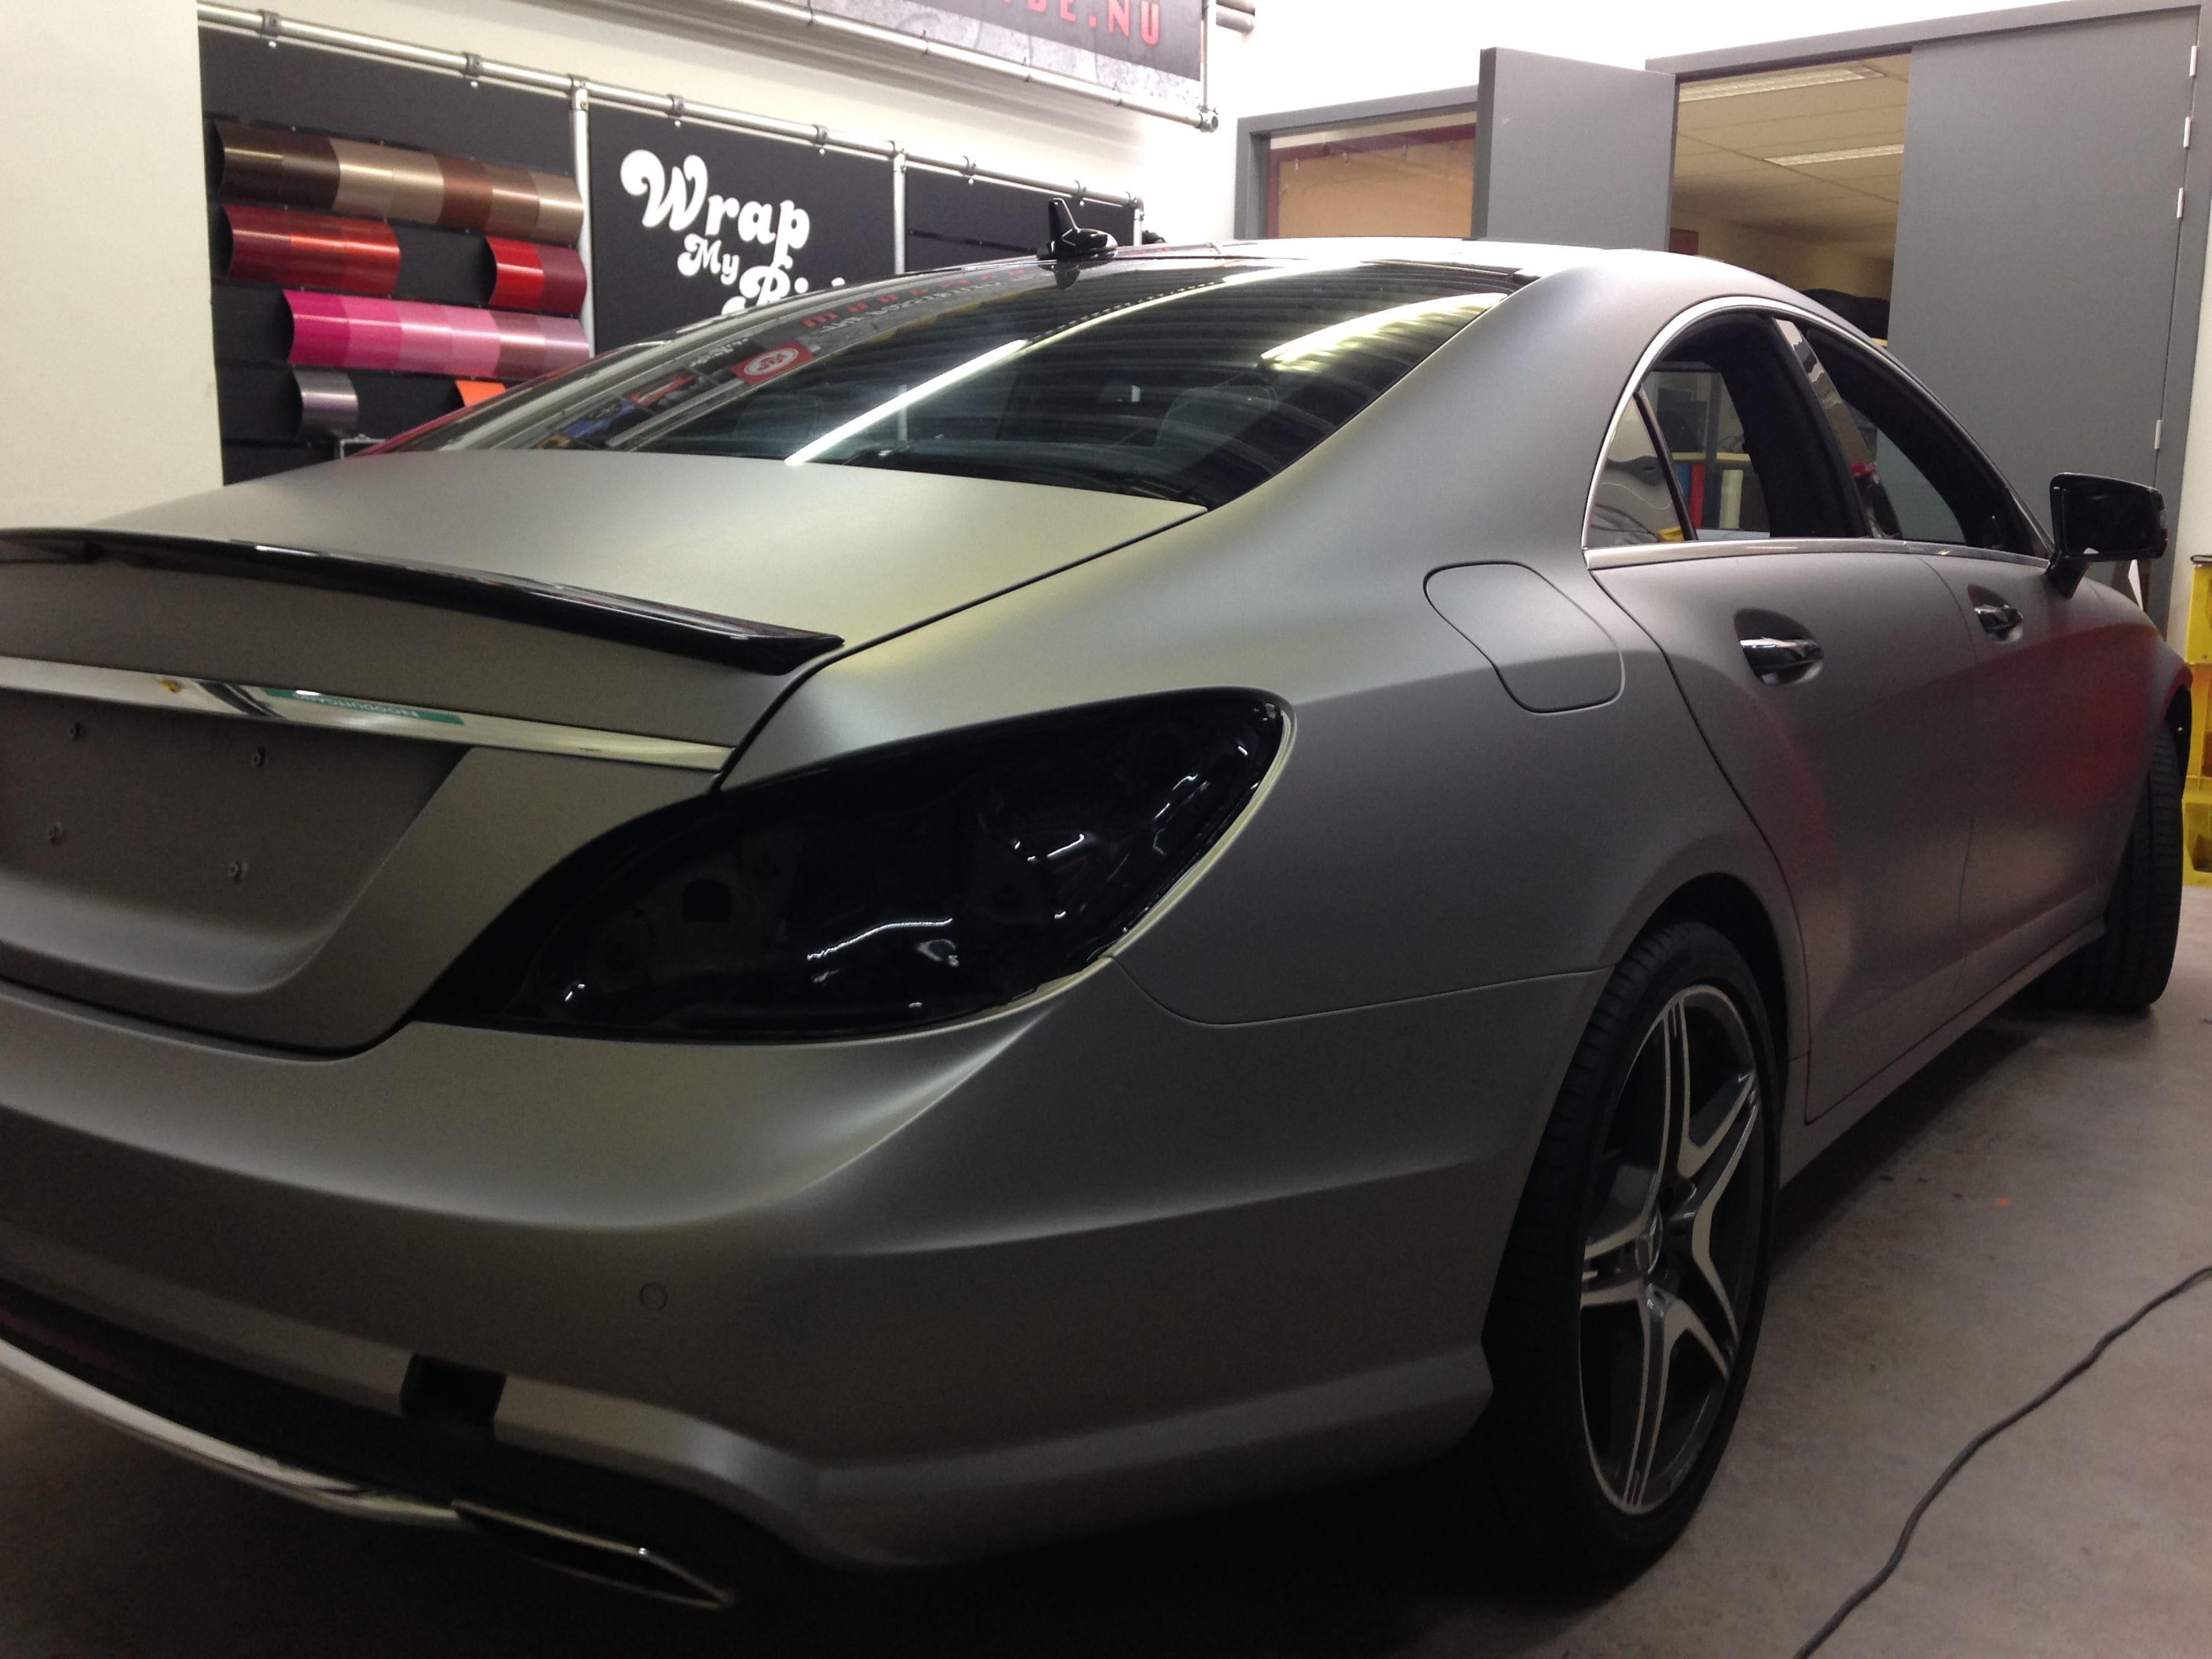 Mercedes CLS met Mat Grey Aluminium Wrap, Carwrapping door Wrapmyride.nu Foto-nr:6134, ©2020